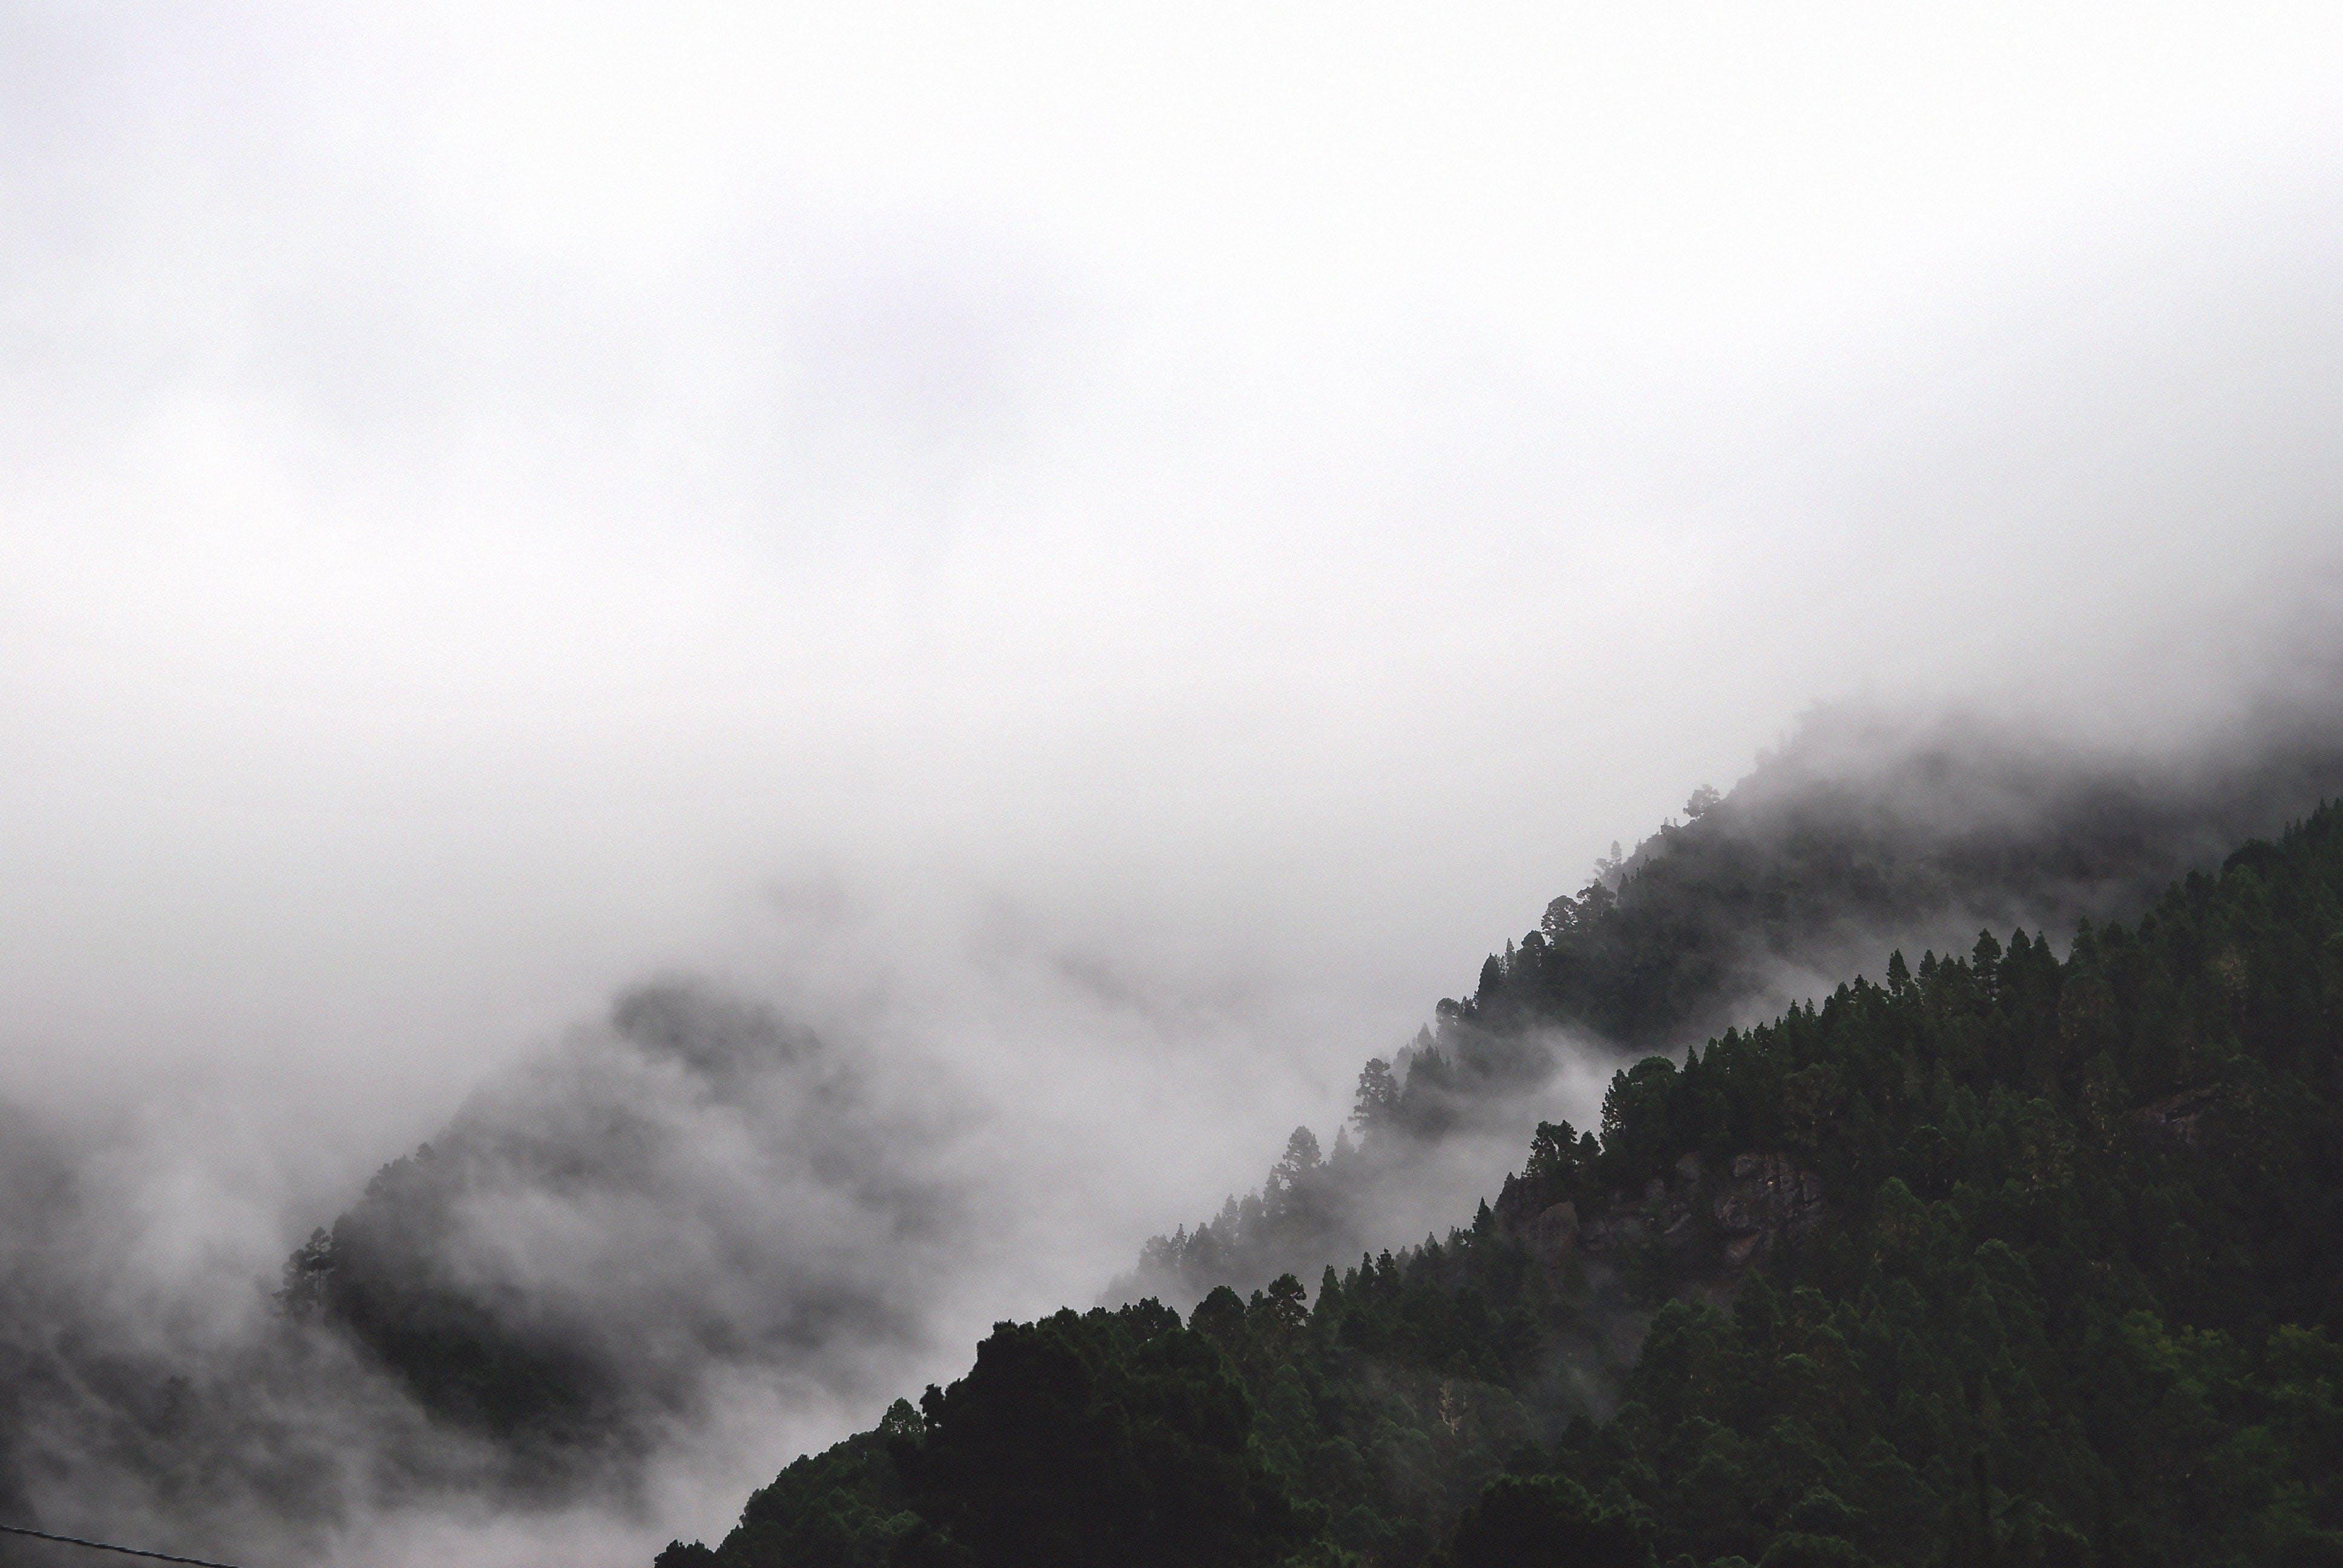 Základová fotografie zdarma na téma černobílá, černobílý, hory, krajina